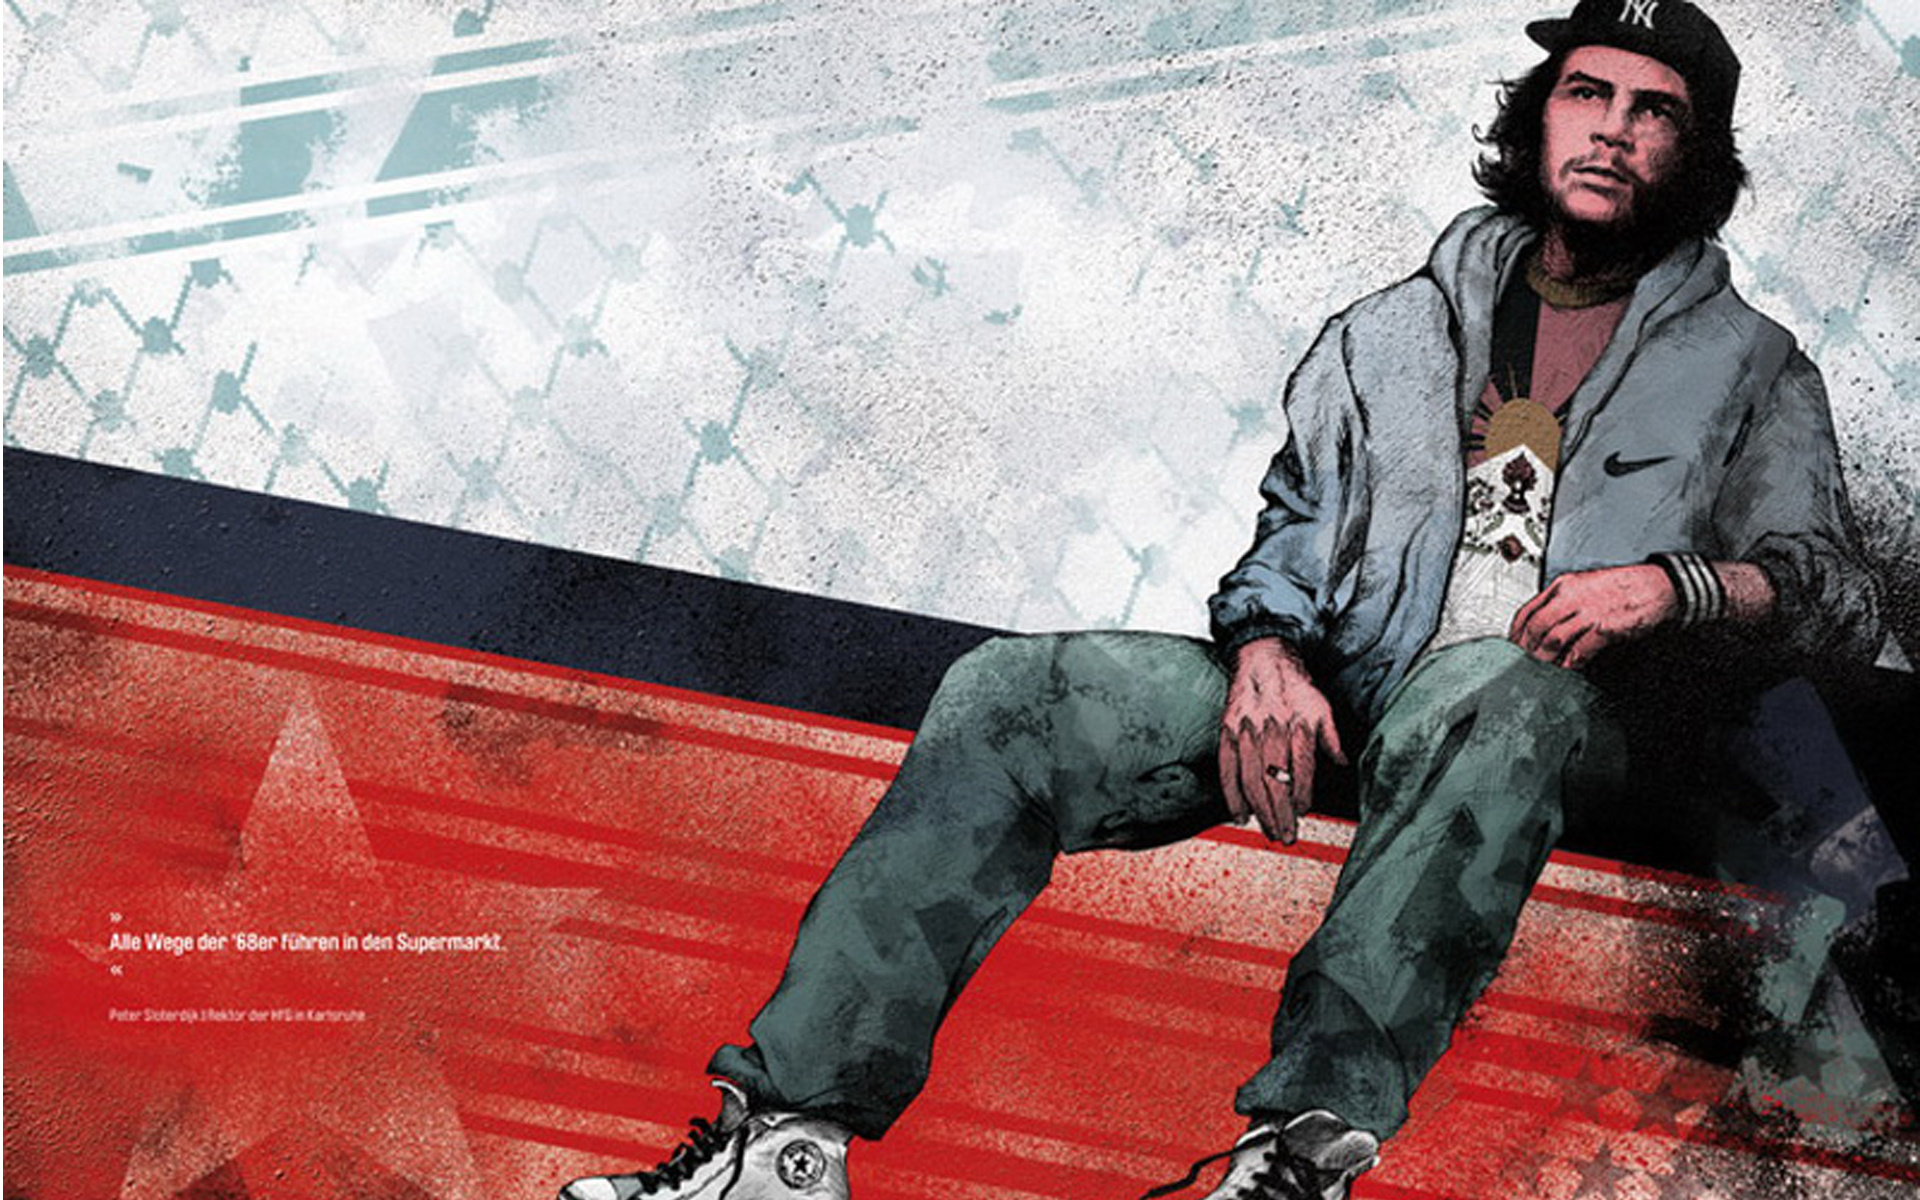 Che Guevara Wallpaper 1920x1200 Wallpapers Pinterest 1920x1200